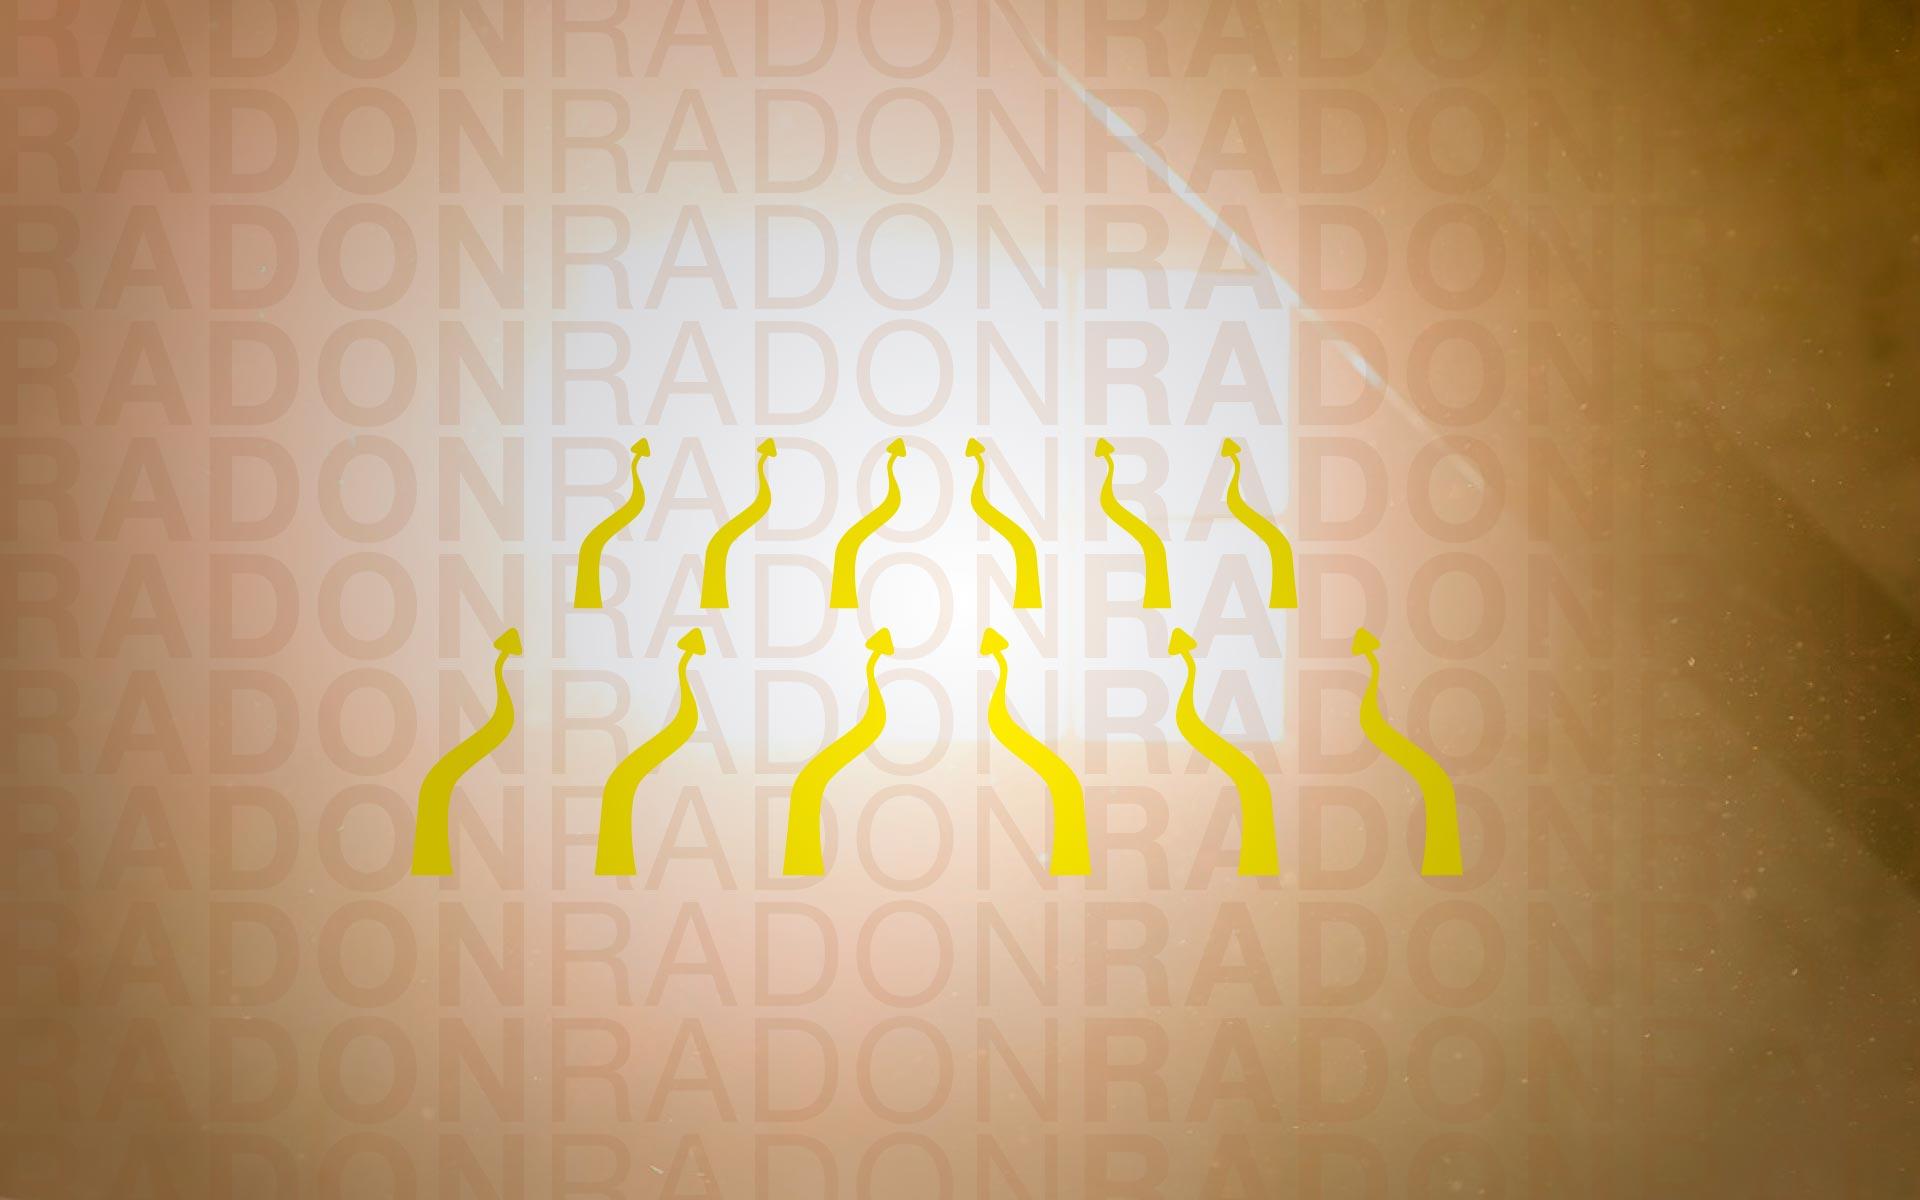 Análisis de radon